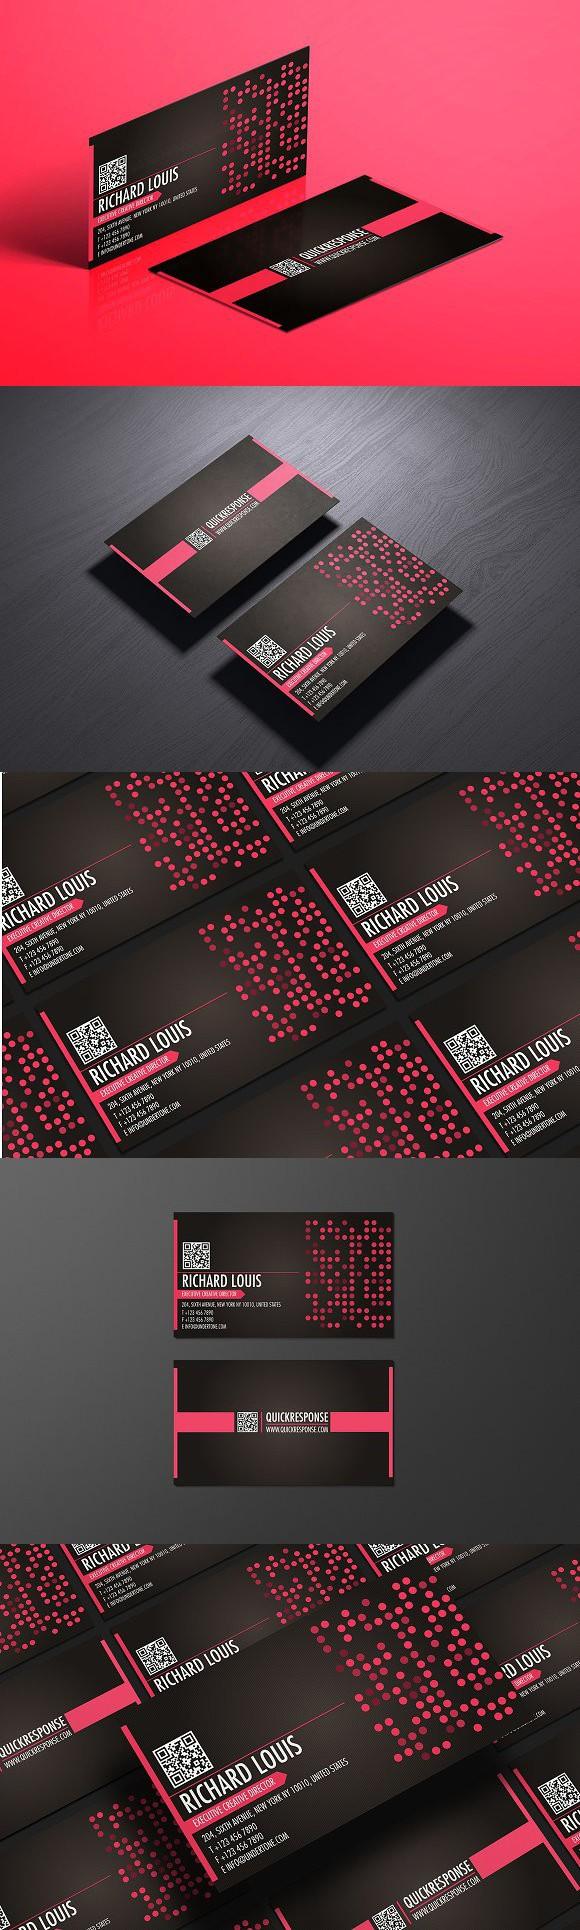 Hot pink business card design. Photoshop Textures | Photoshop ...